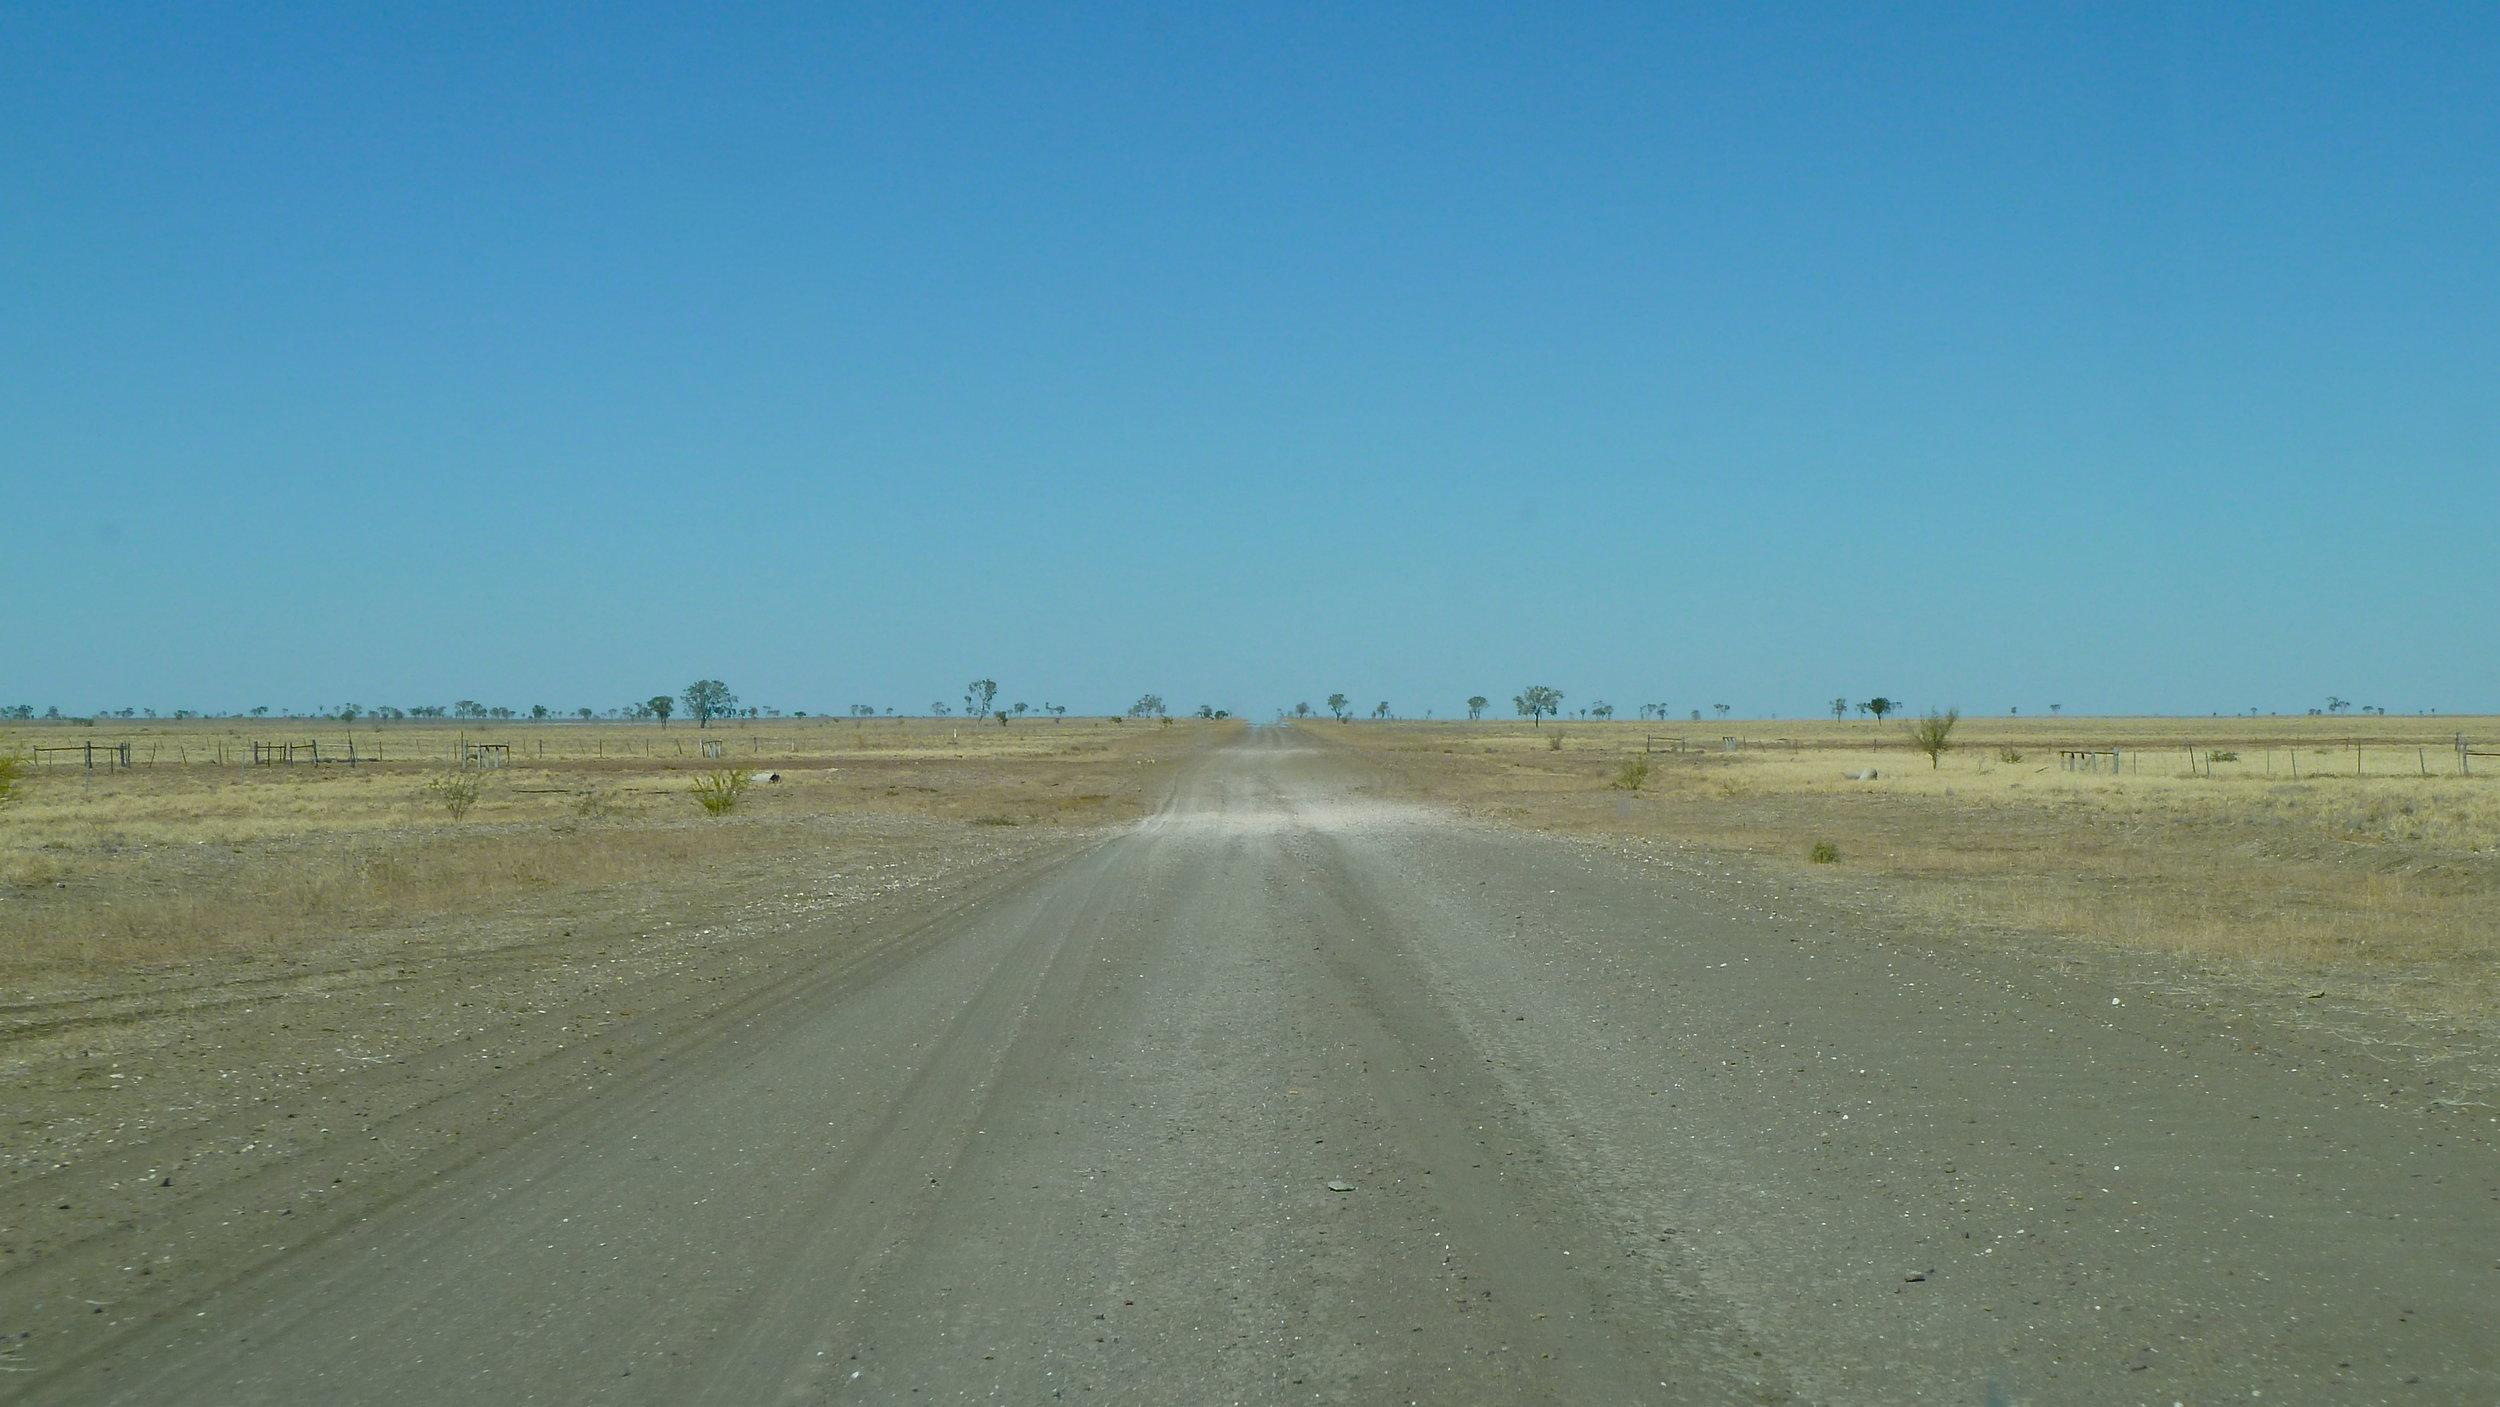 Grass-plains nothingness